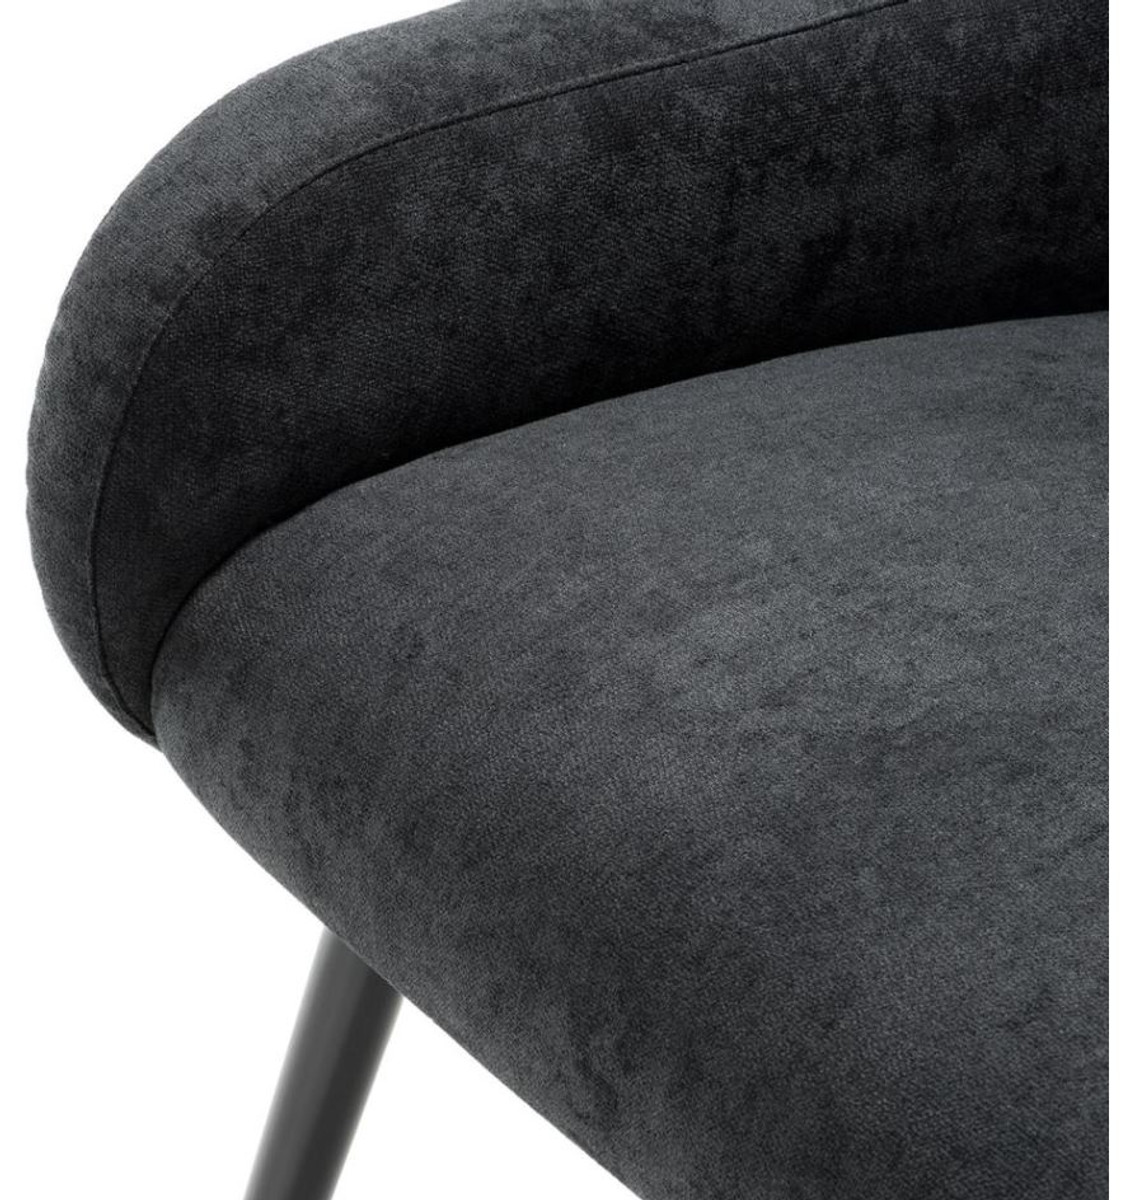 Casa Padrino designer dining chair with armrests luxury  : Casa Padrino Designer Hochstuhl Barstuhl Barh3 from www.barockgrosshandel.de size 893 x 944 jpeg 147kB